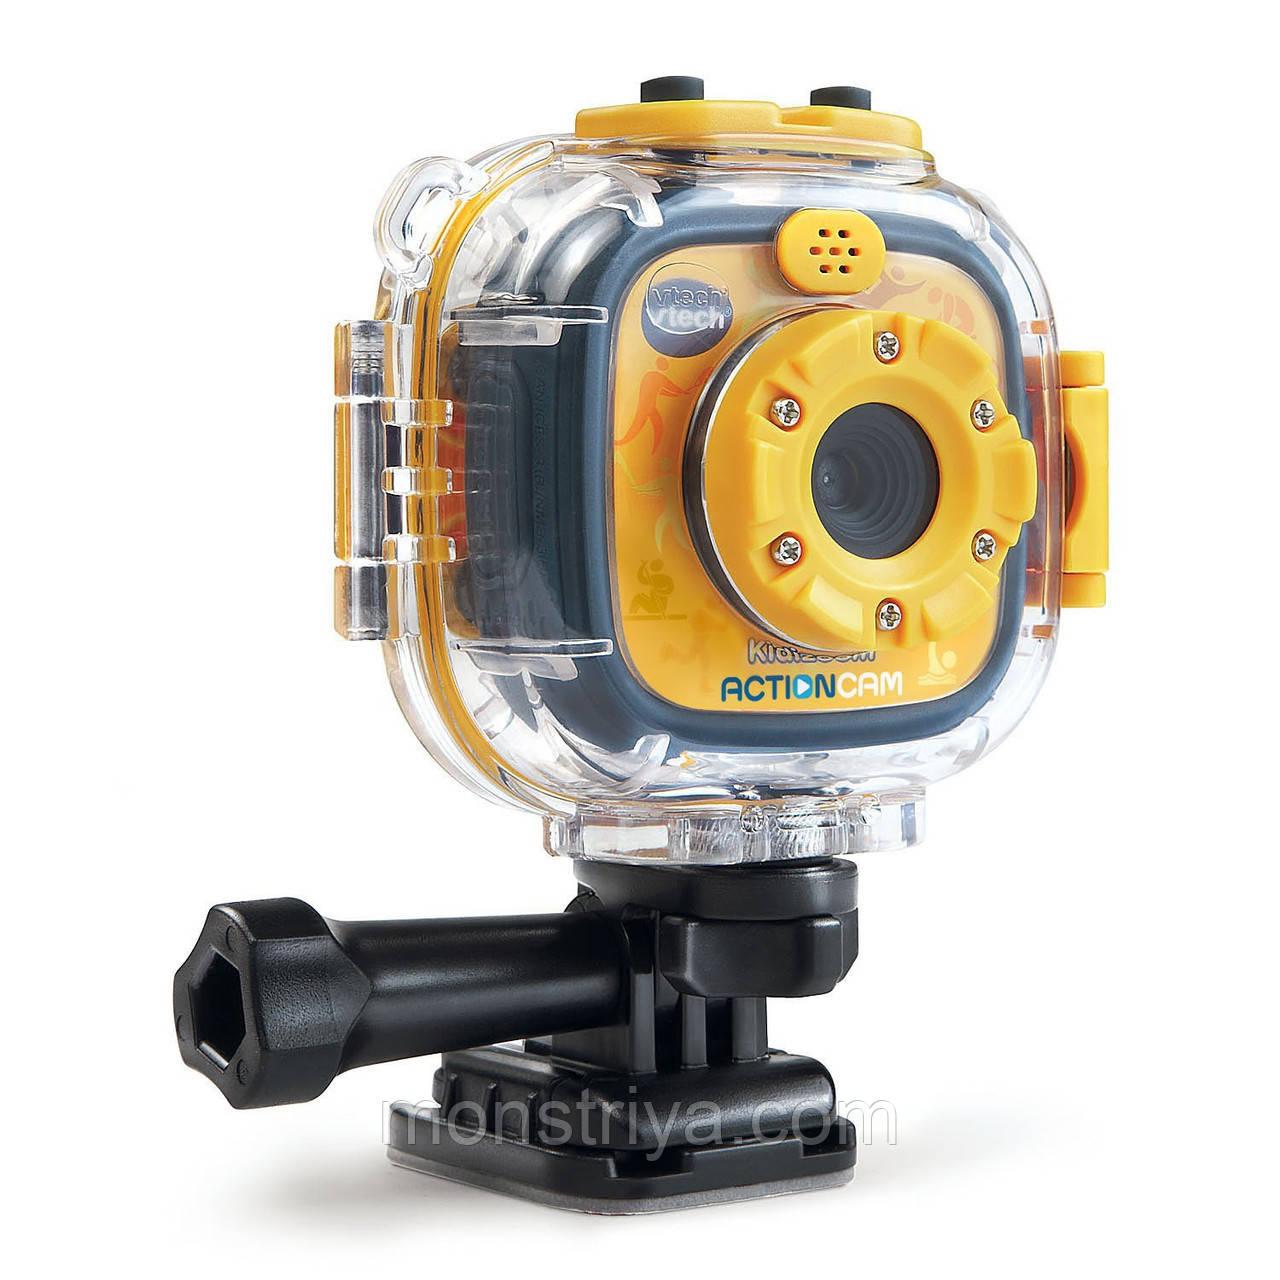 Камера VTECH Kidizoom Action Cam